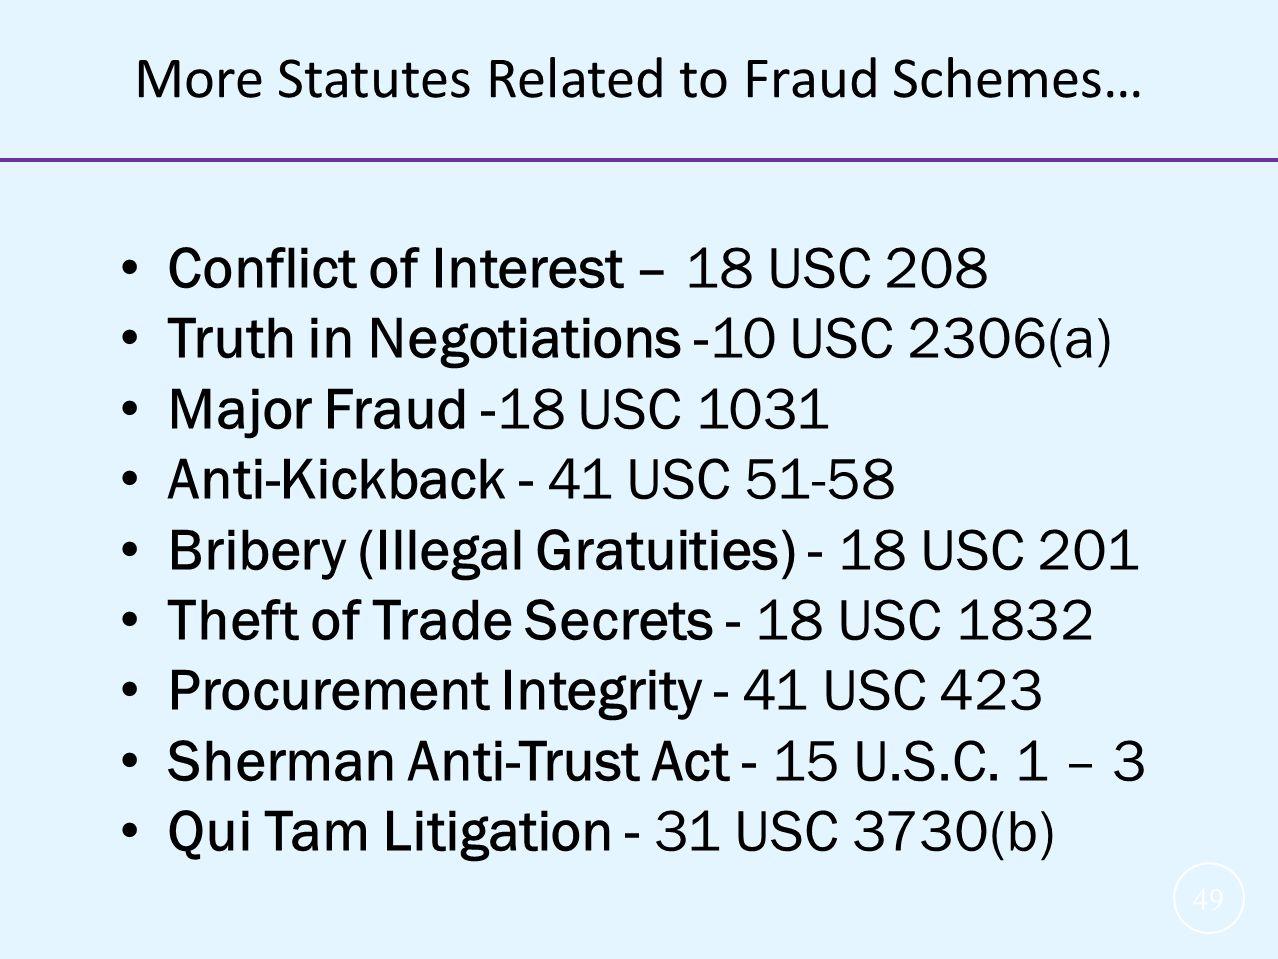 49 Conflict of Interest – 18 USC 208 Truth in Negotiations -10 USC 2306(a) Major Fraud -18 USC 1031 Anti-Kickback - 41 USC 51-58 Bribery (Illegal Grat